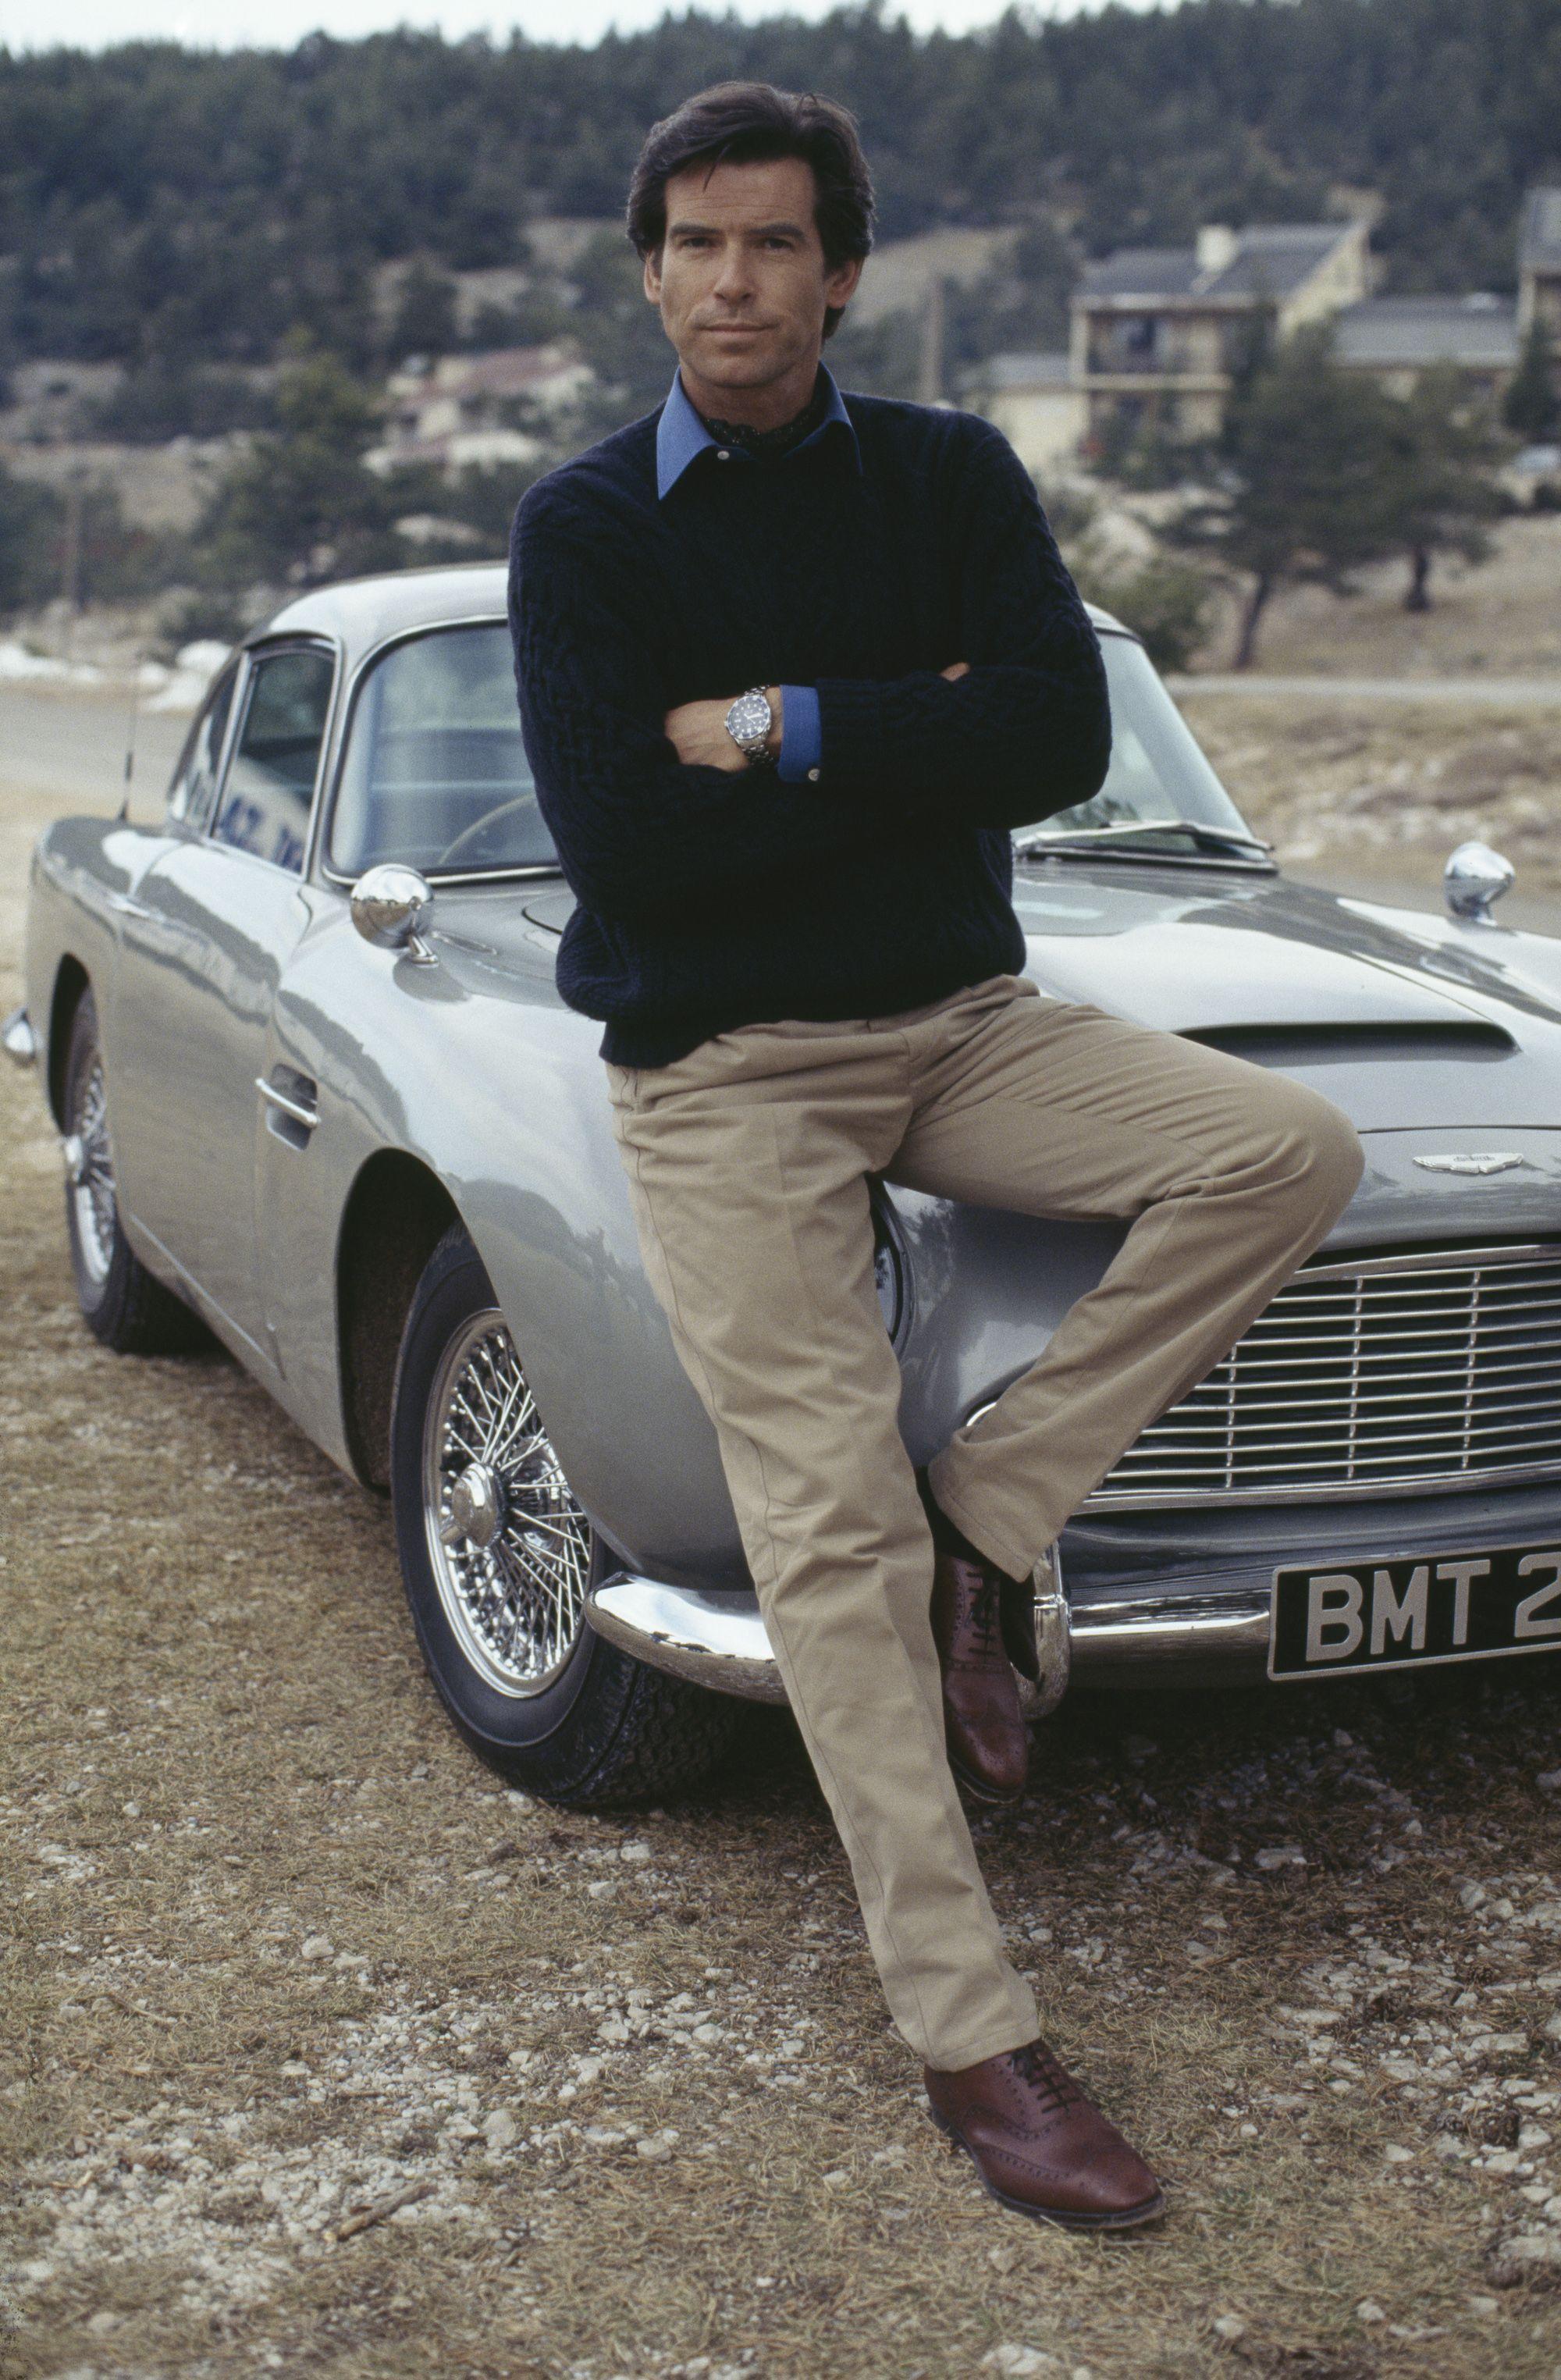 Pierce Brosnan Wants to See a Female James Bond